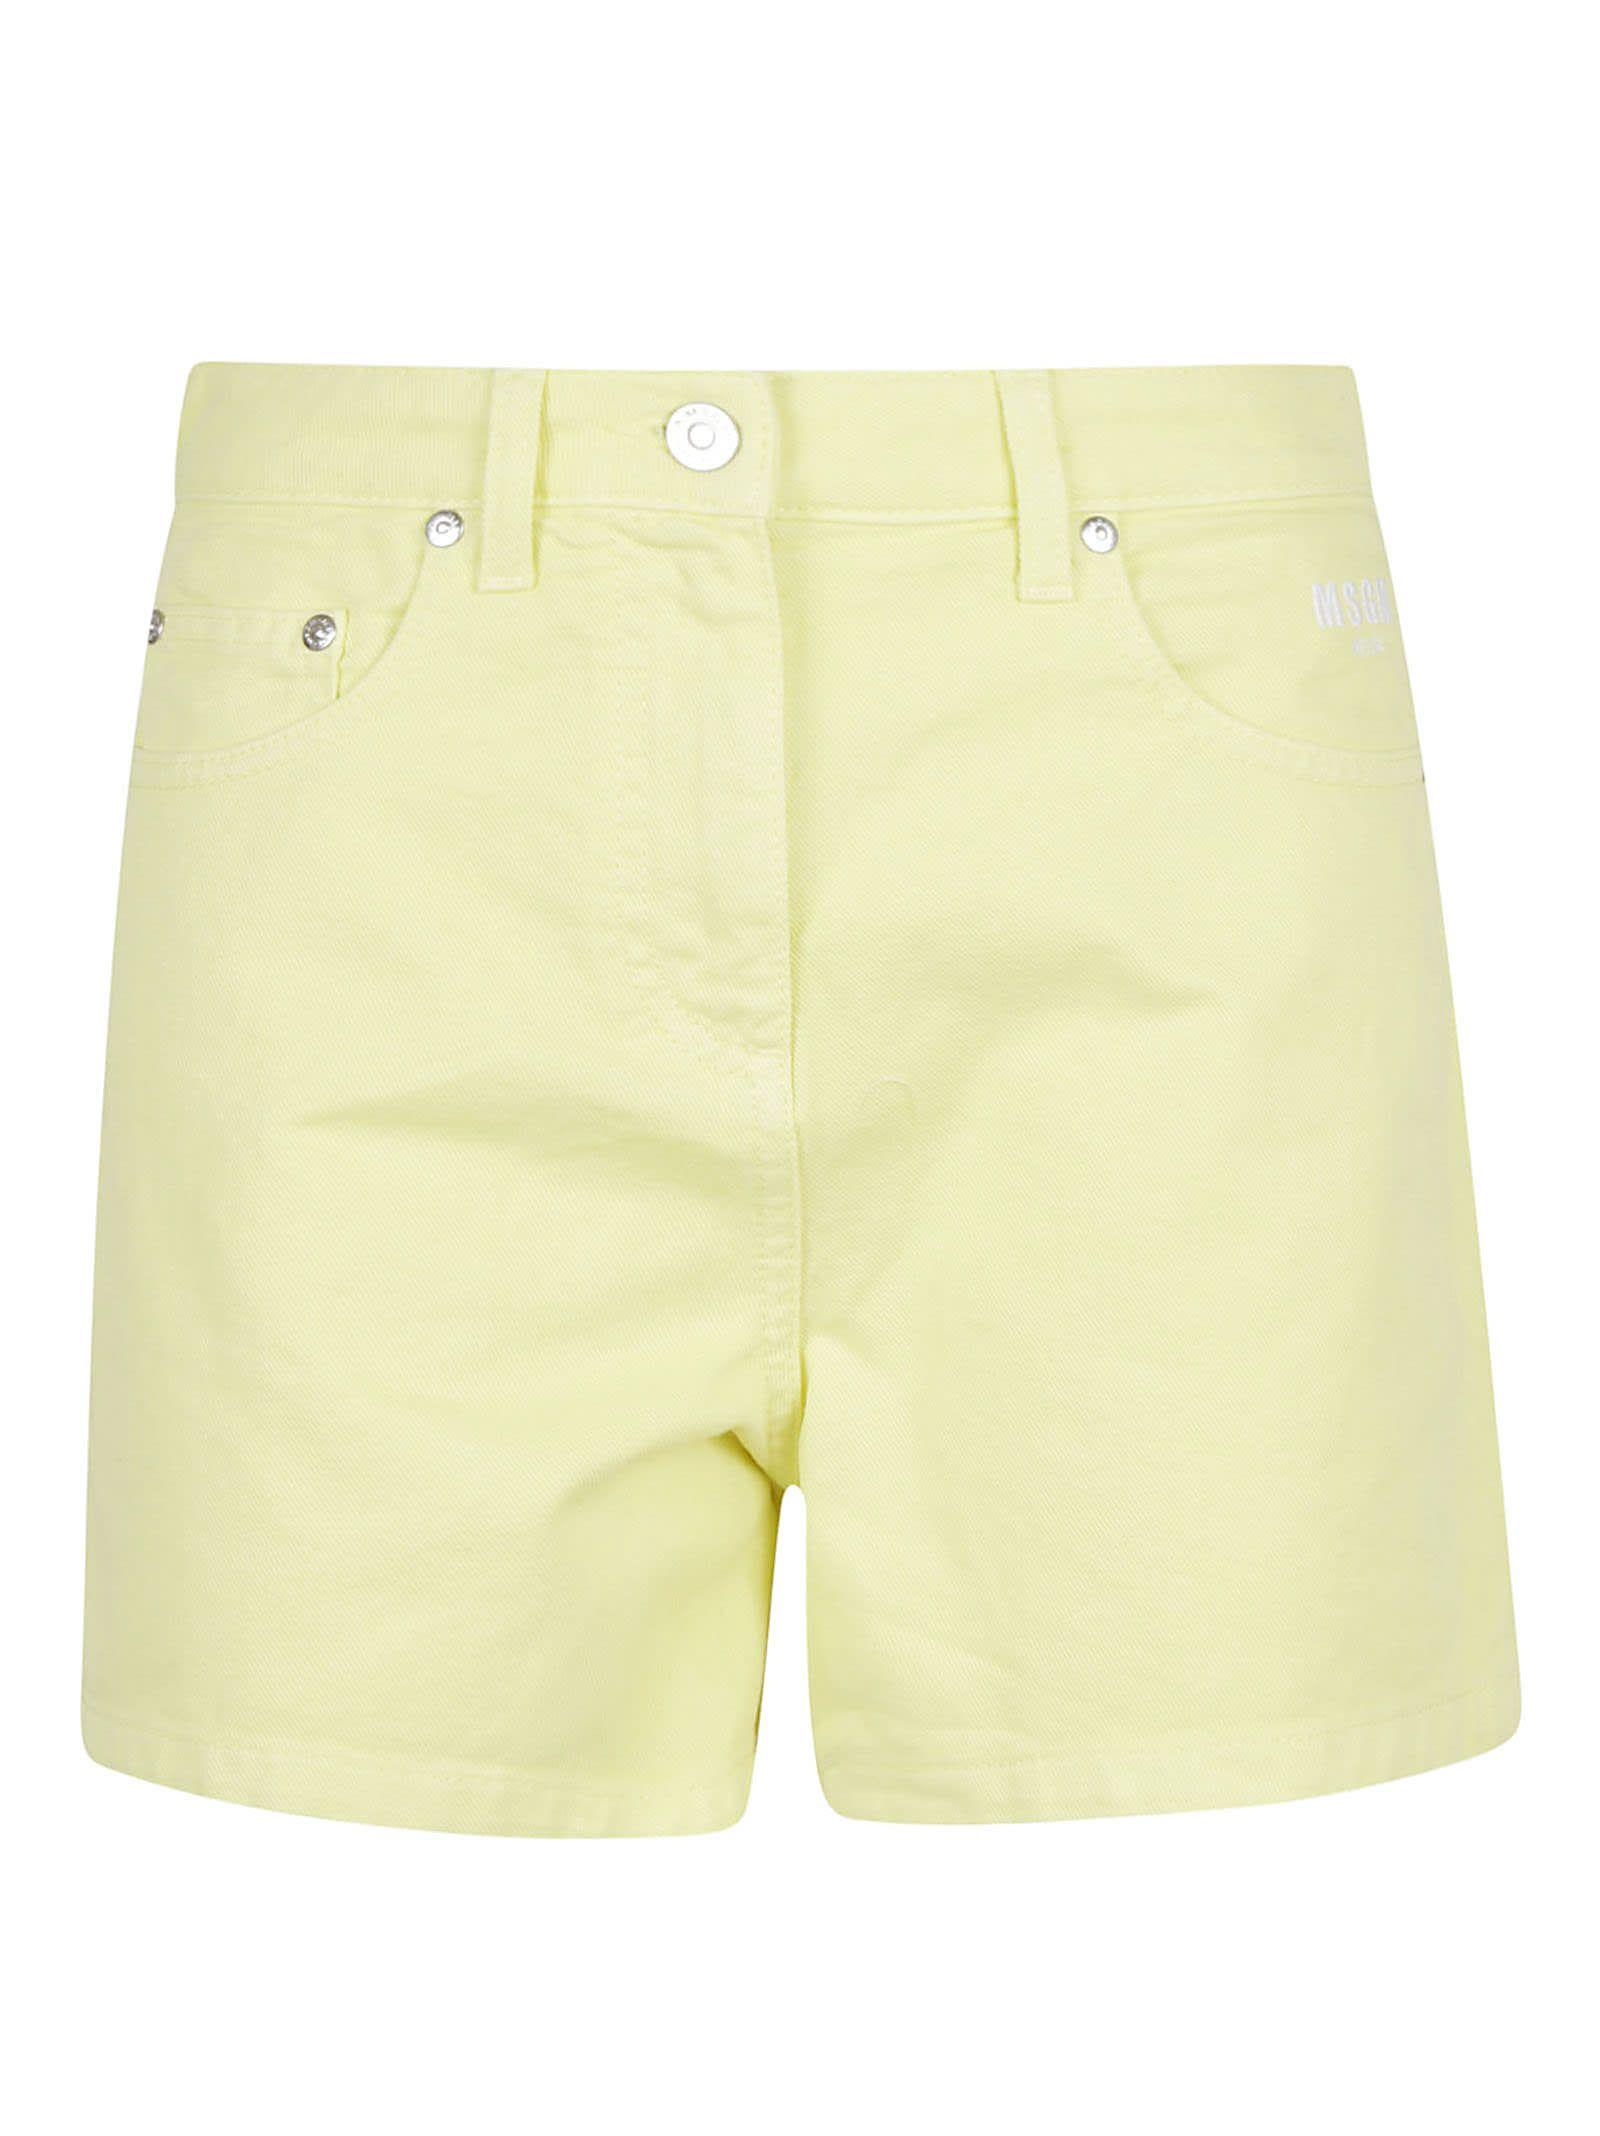 MSGM Bermuda In Denim/denim Shorts from MSGMComposition: 100% Co